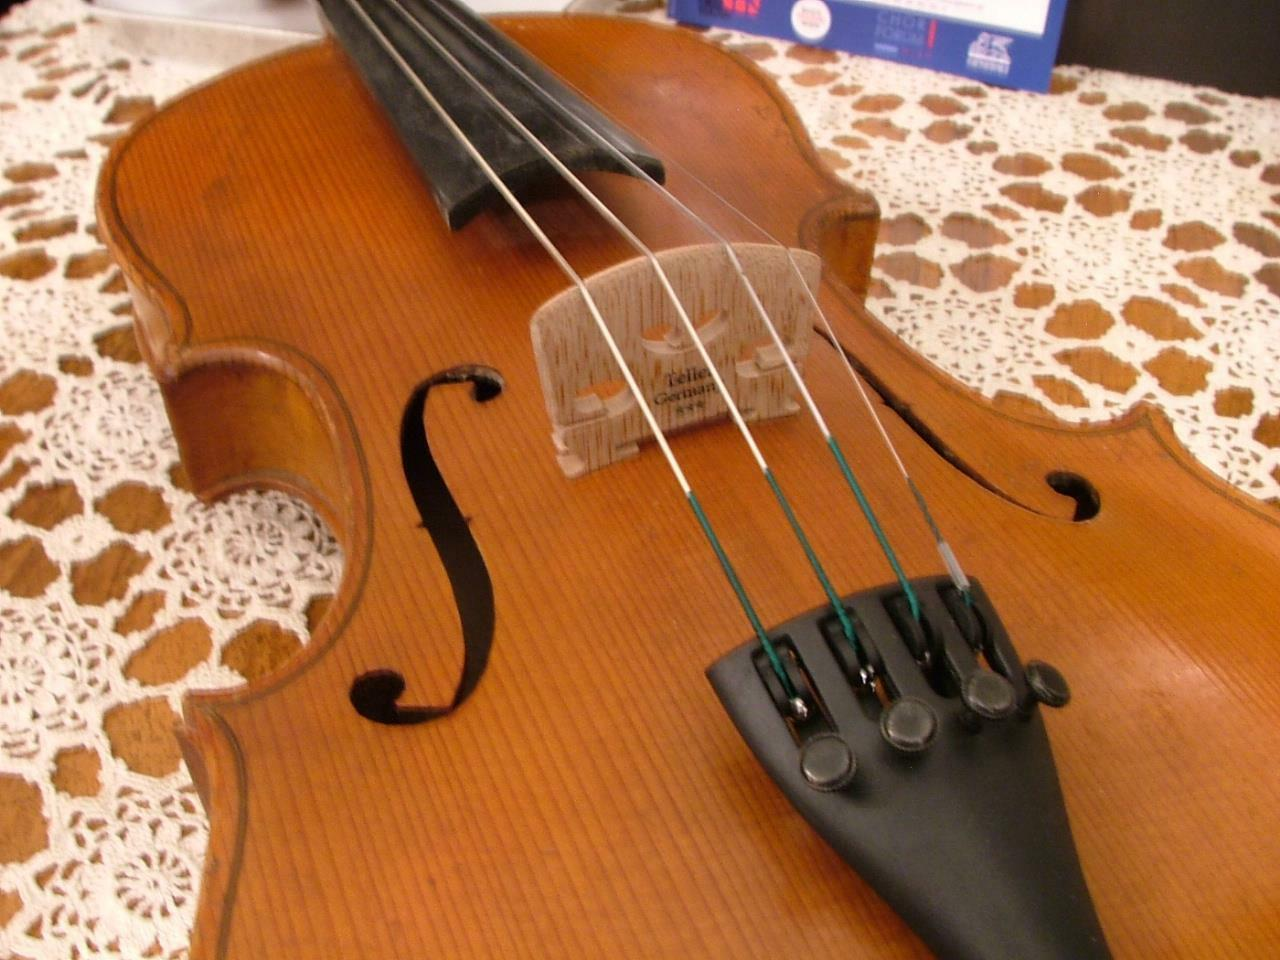 Muy bella listo birimbao violín violín 4 4 1930 aprox. aprox. aprox. d8bd2f